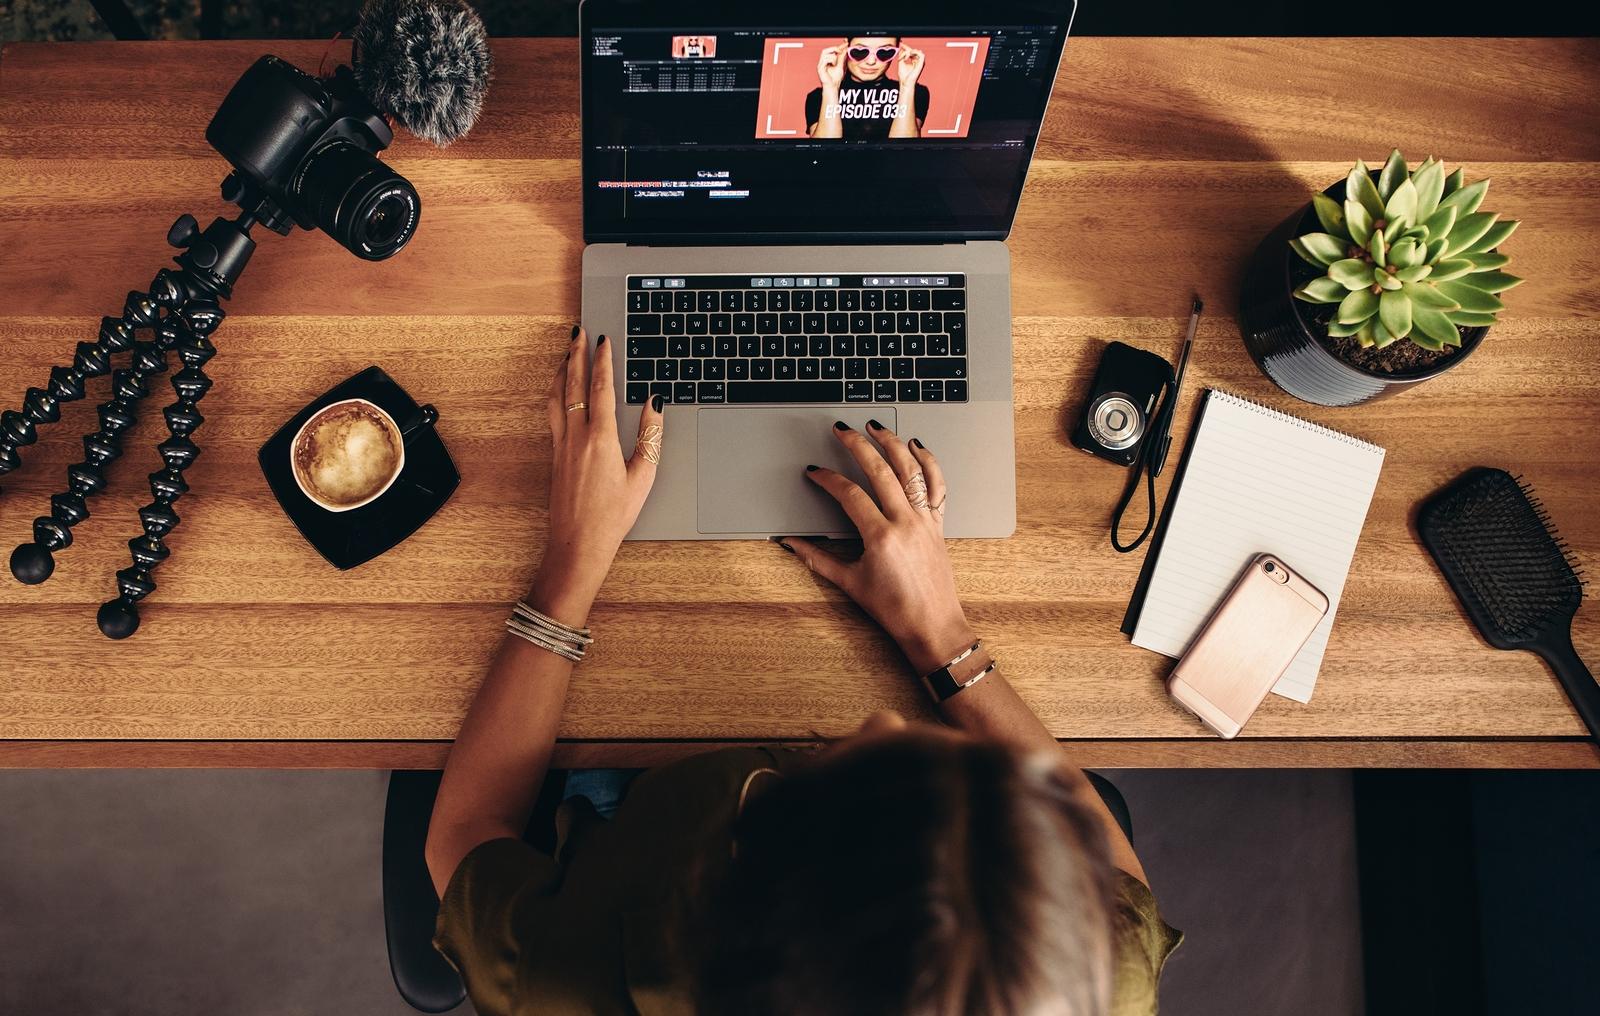 video, slef storage video, self storage, insurance, self storage insurance